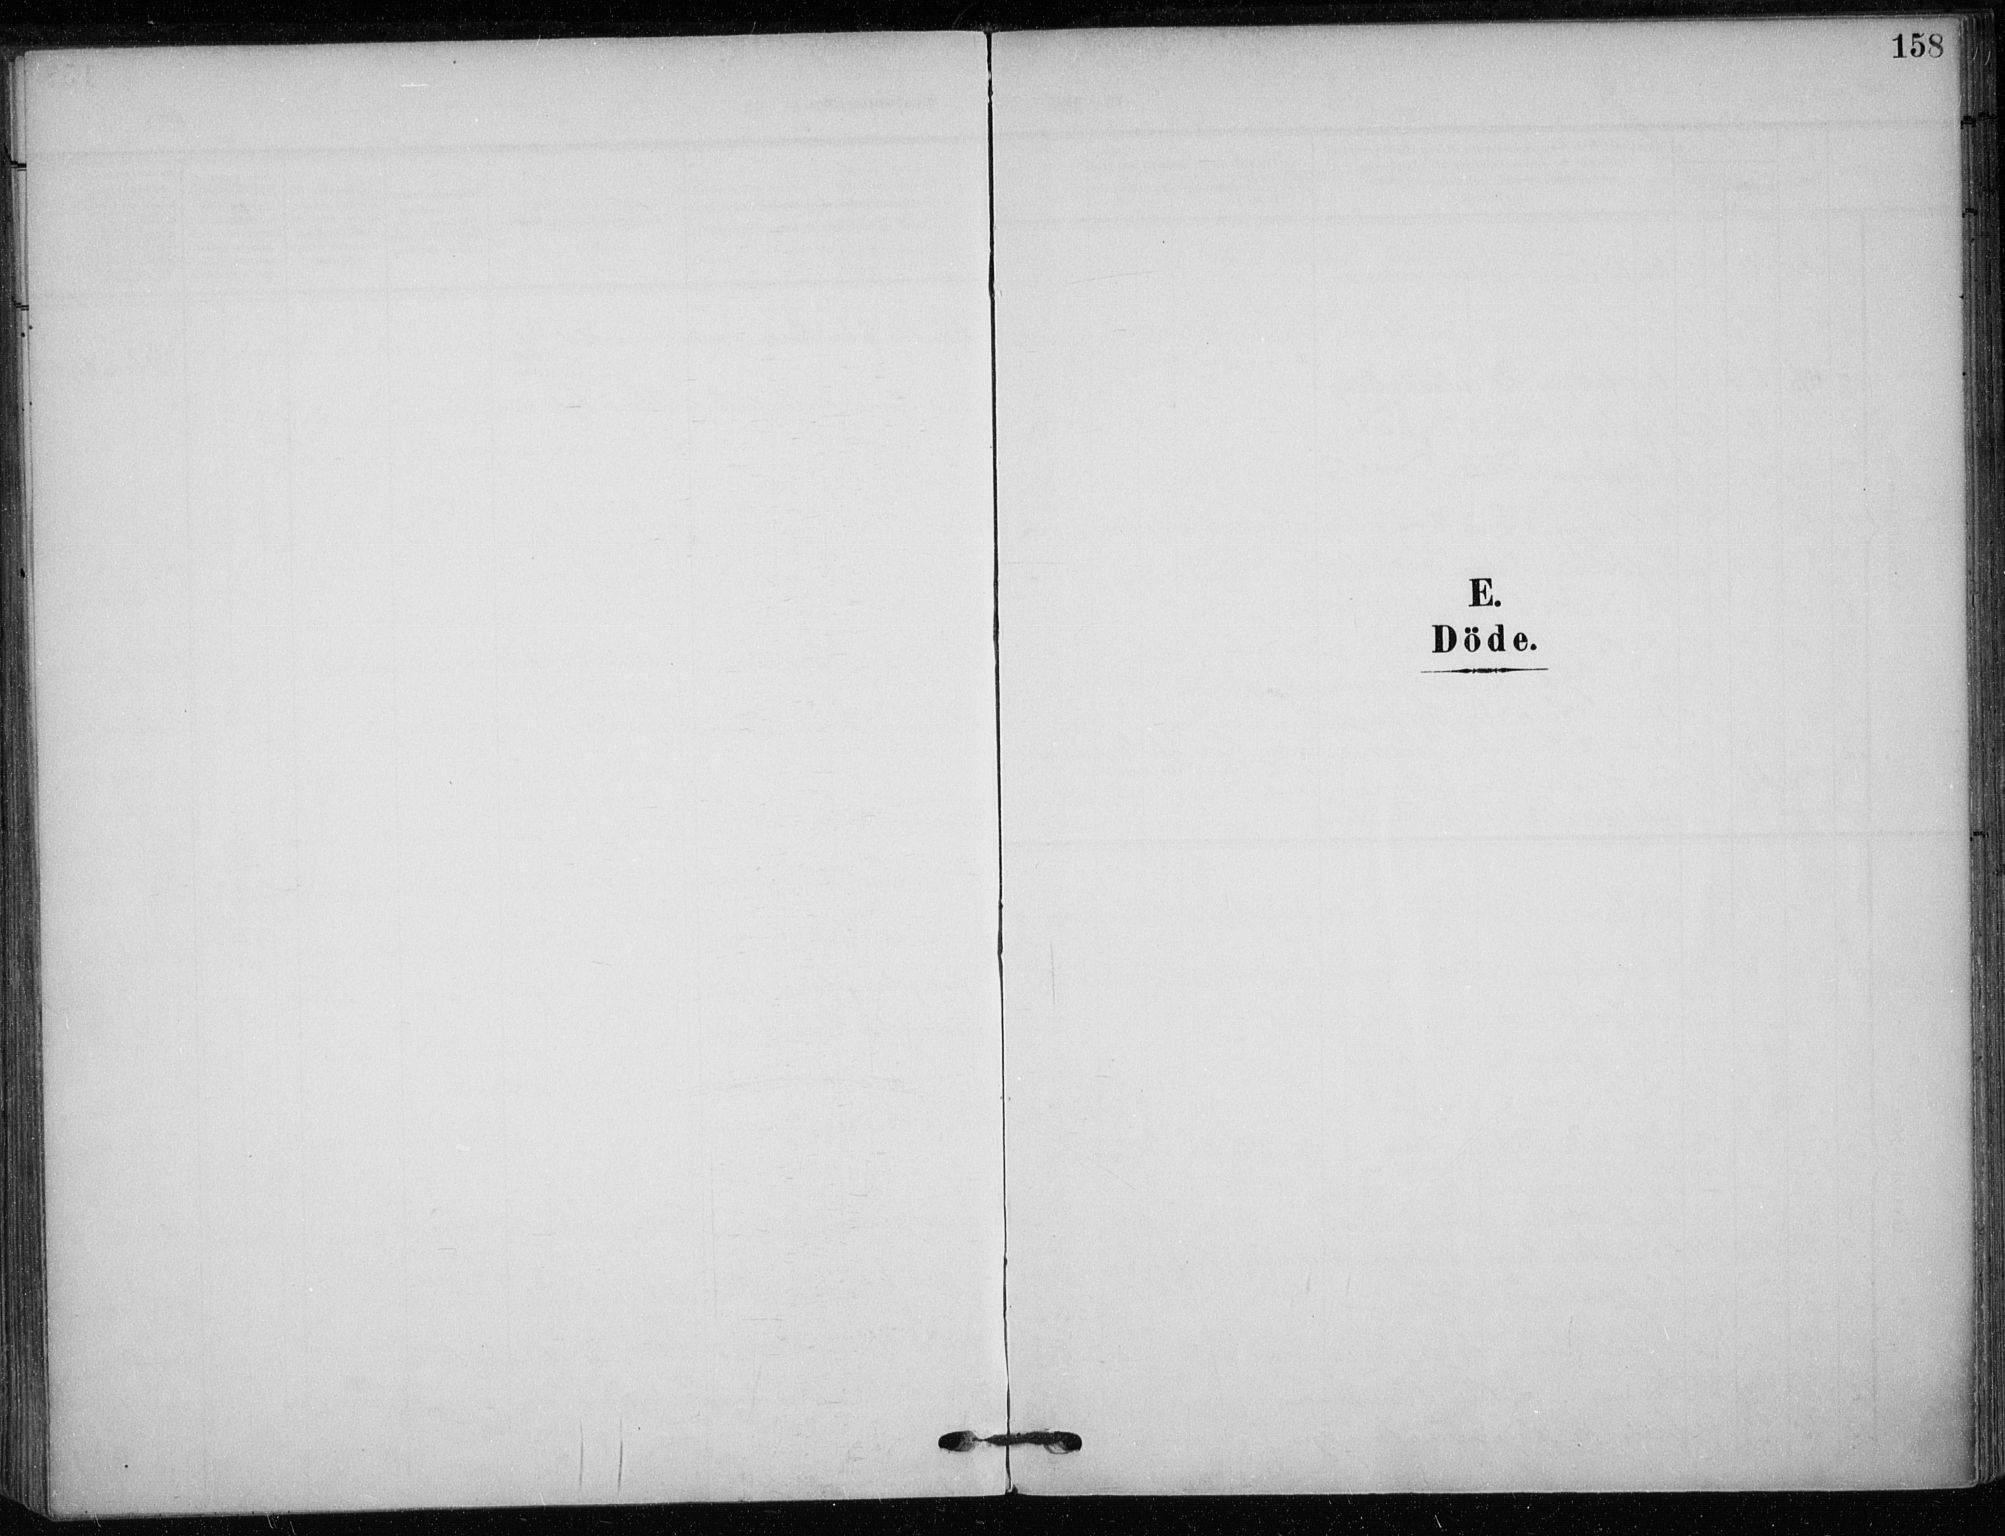 SATØ, Hammerfest sokneprestembete, Ministerialbok nr. 14, 1906-1916, s. 158